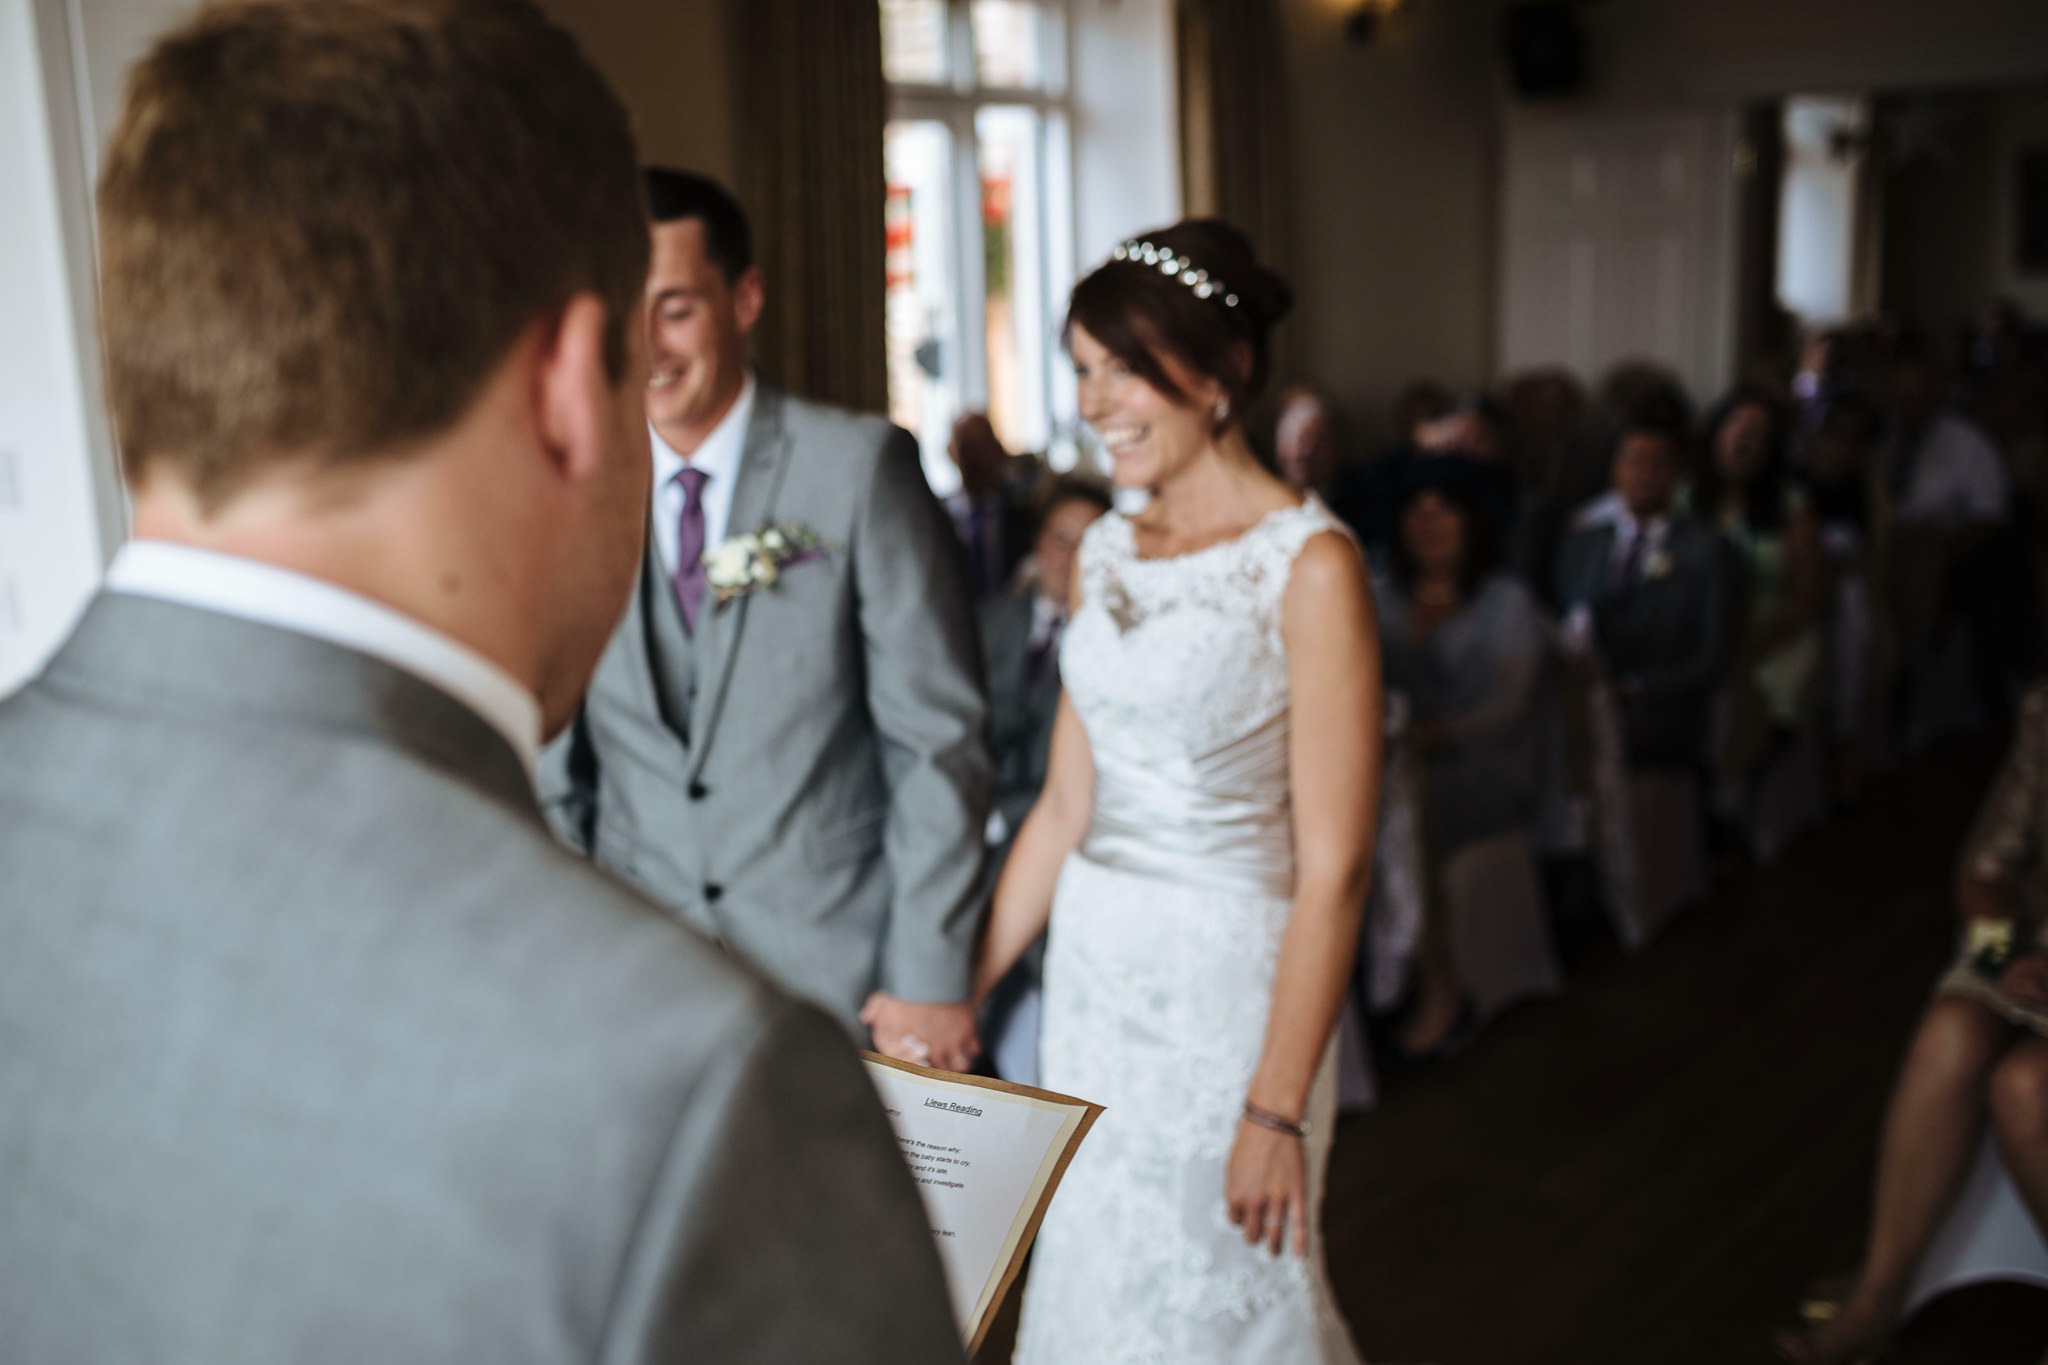 paul-marbrook-Caer-Llan-Wedding-Photographer-90045